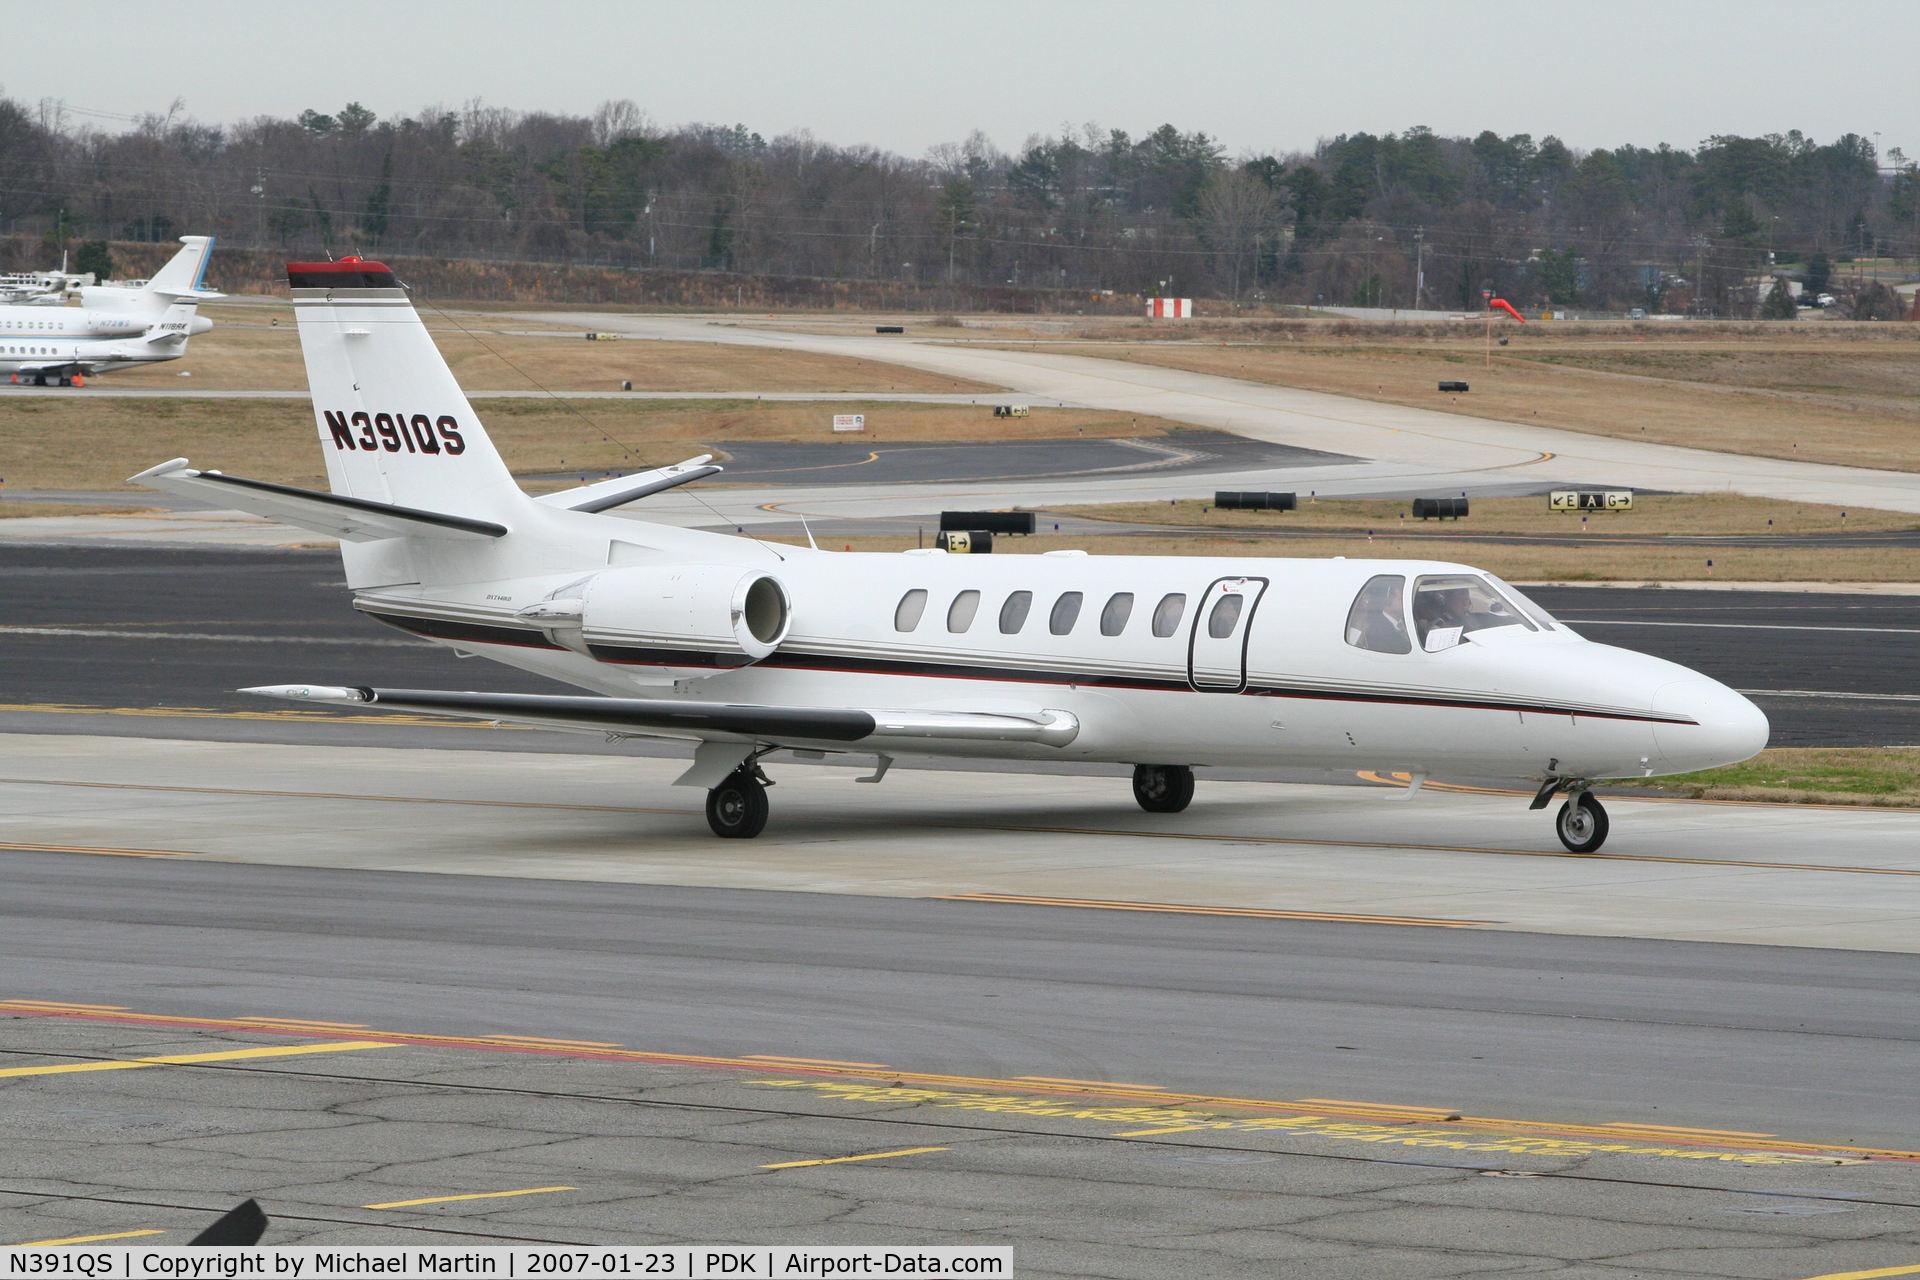 N391QS, 1998 Cessna 560 C/N 560-0493, Taxing to Runway 2R